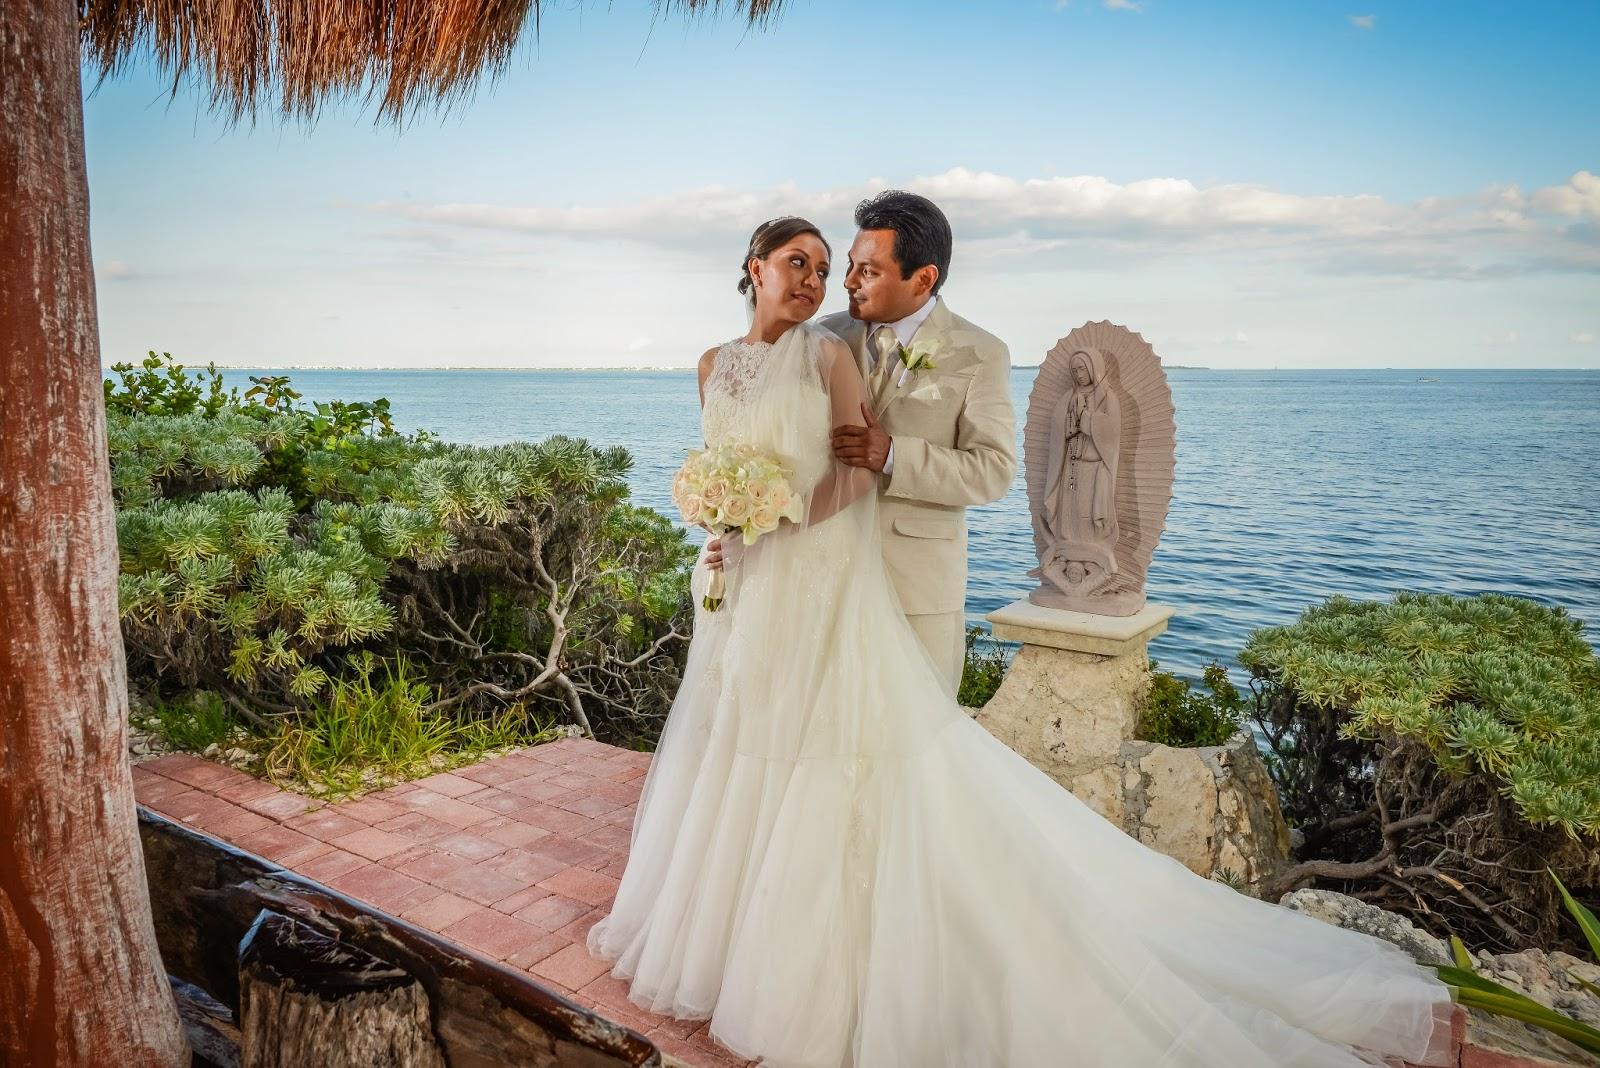 Party boutique canc n bodas en la playa decoraci n en for Decoracion en cancun